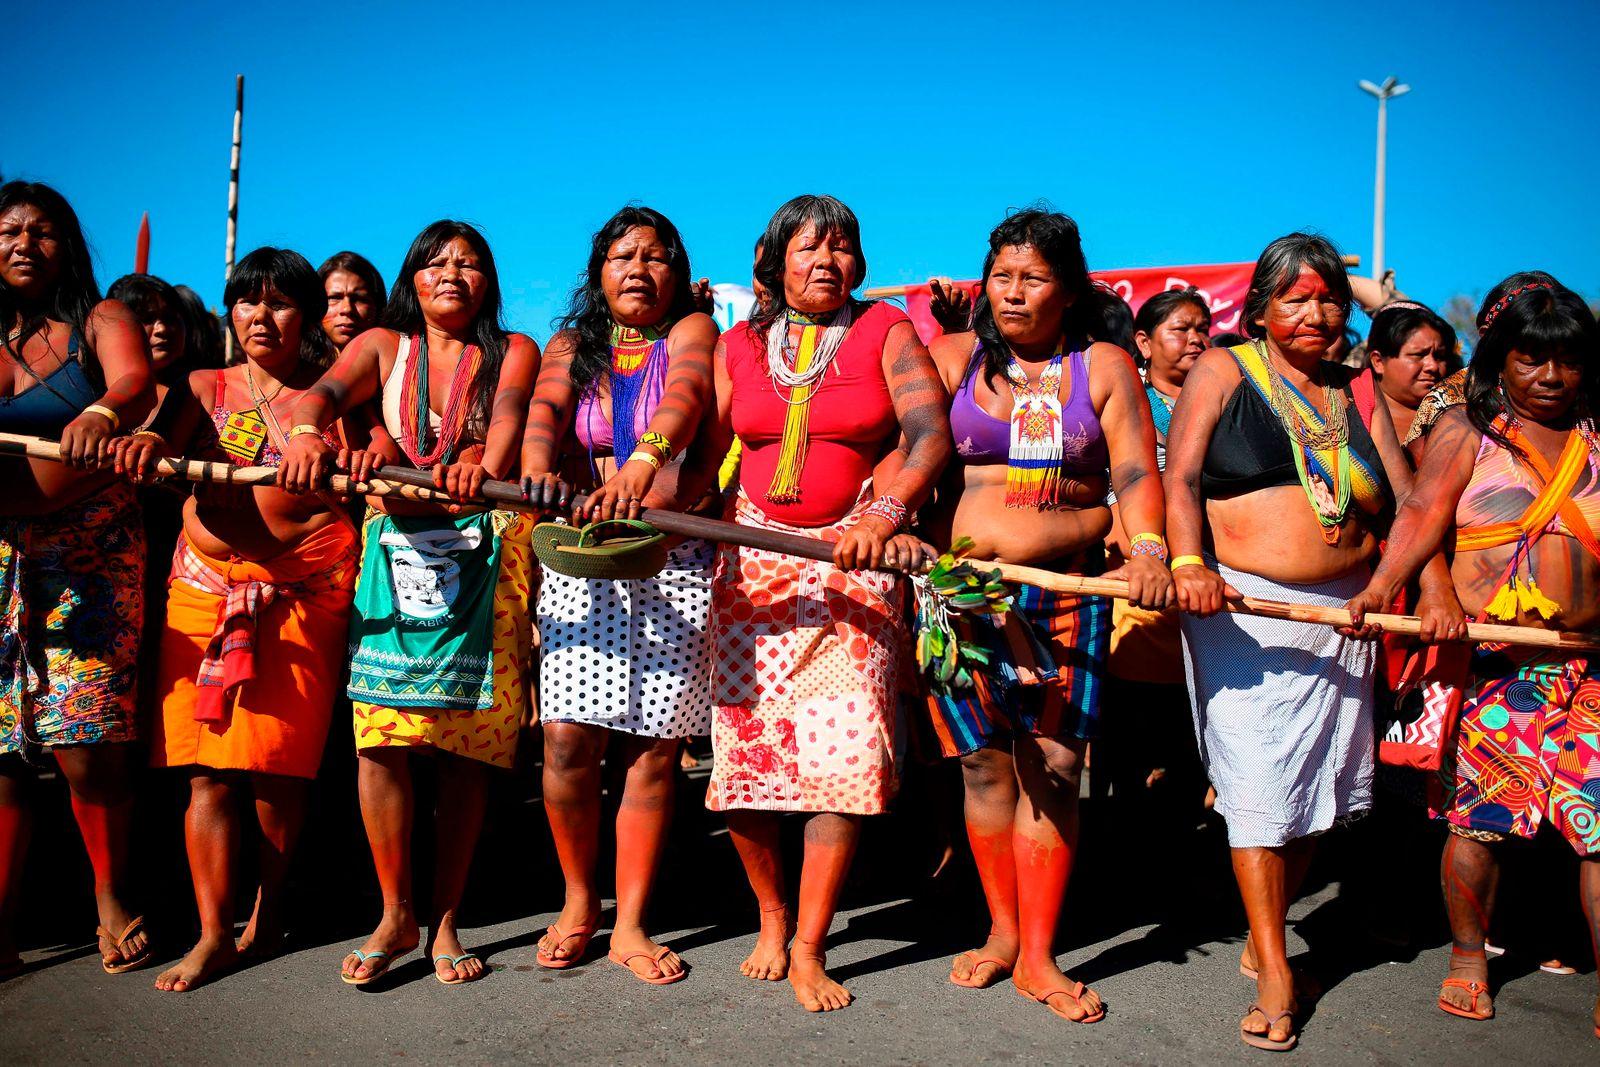 TOPSHOT-BRAZIL-INDIGENOUS-WOMEN-PROTEST